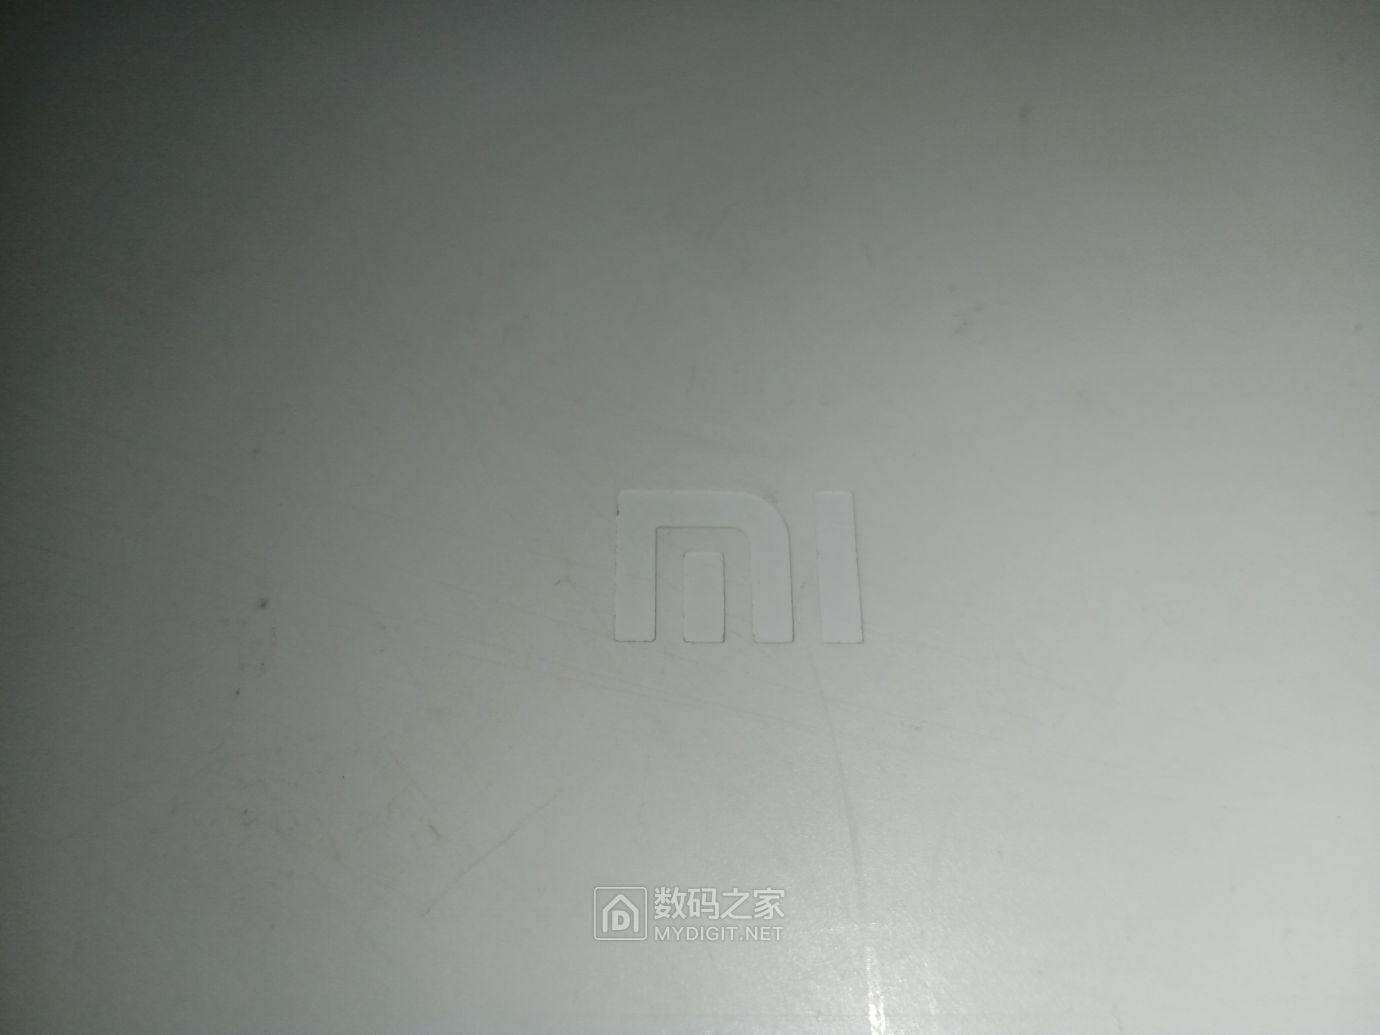 IMG_20200314_181918.jpg